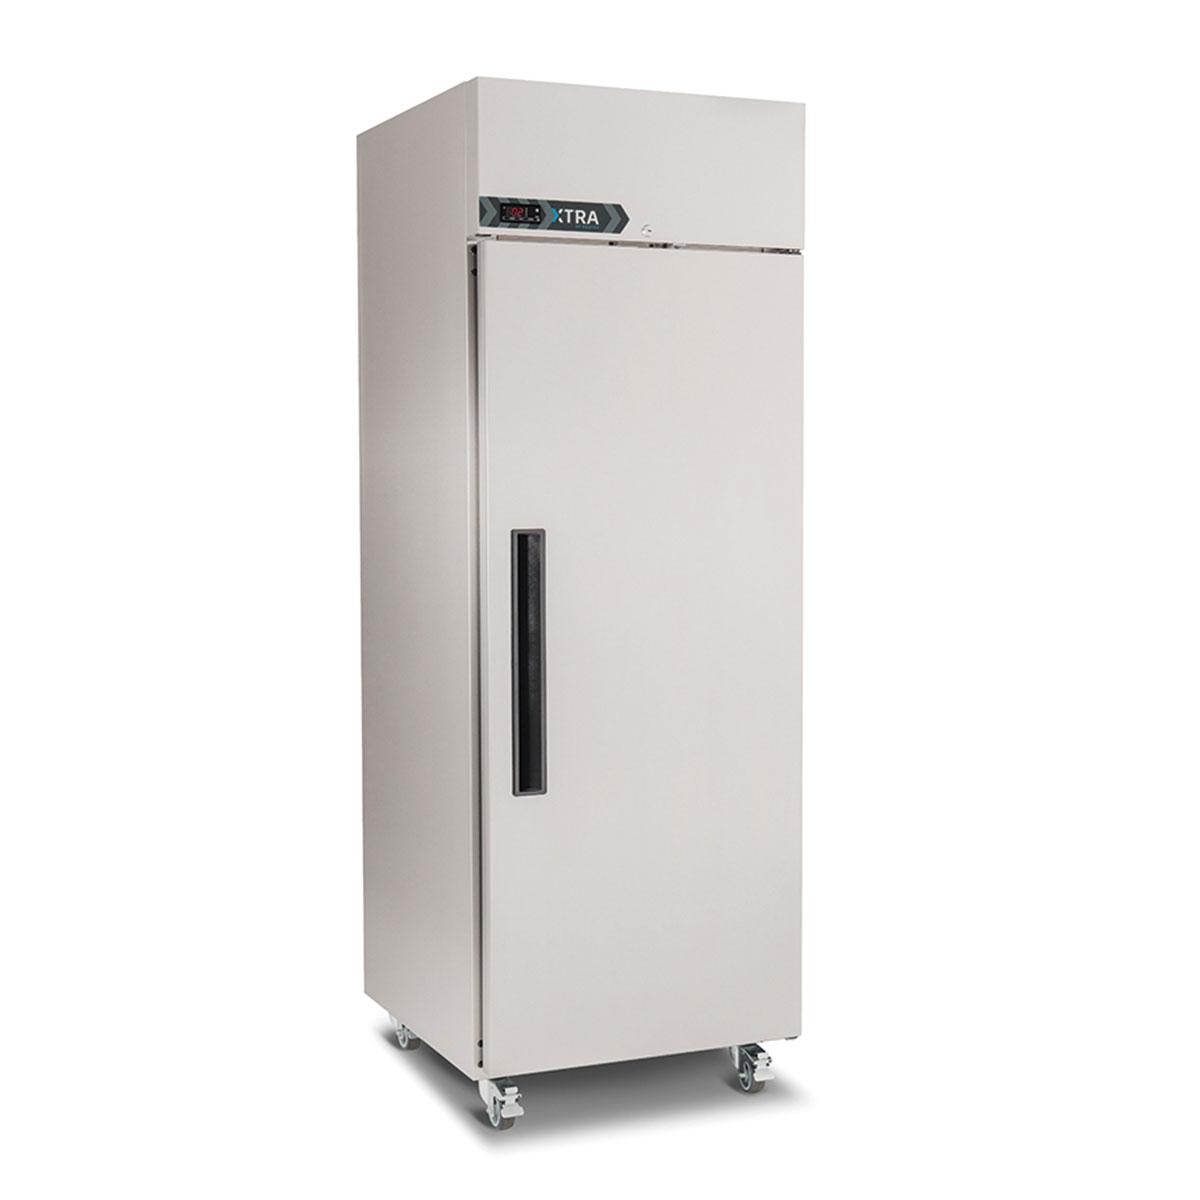 Foster xtra Single Door 1 - Refrigeration Equipment Suppliers in Cornwall